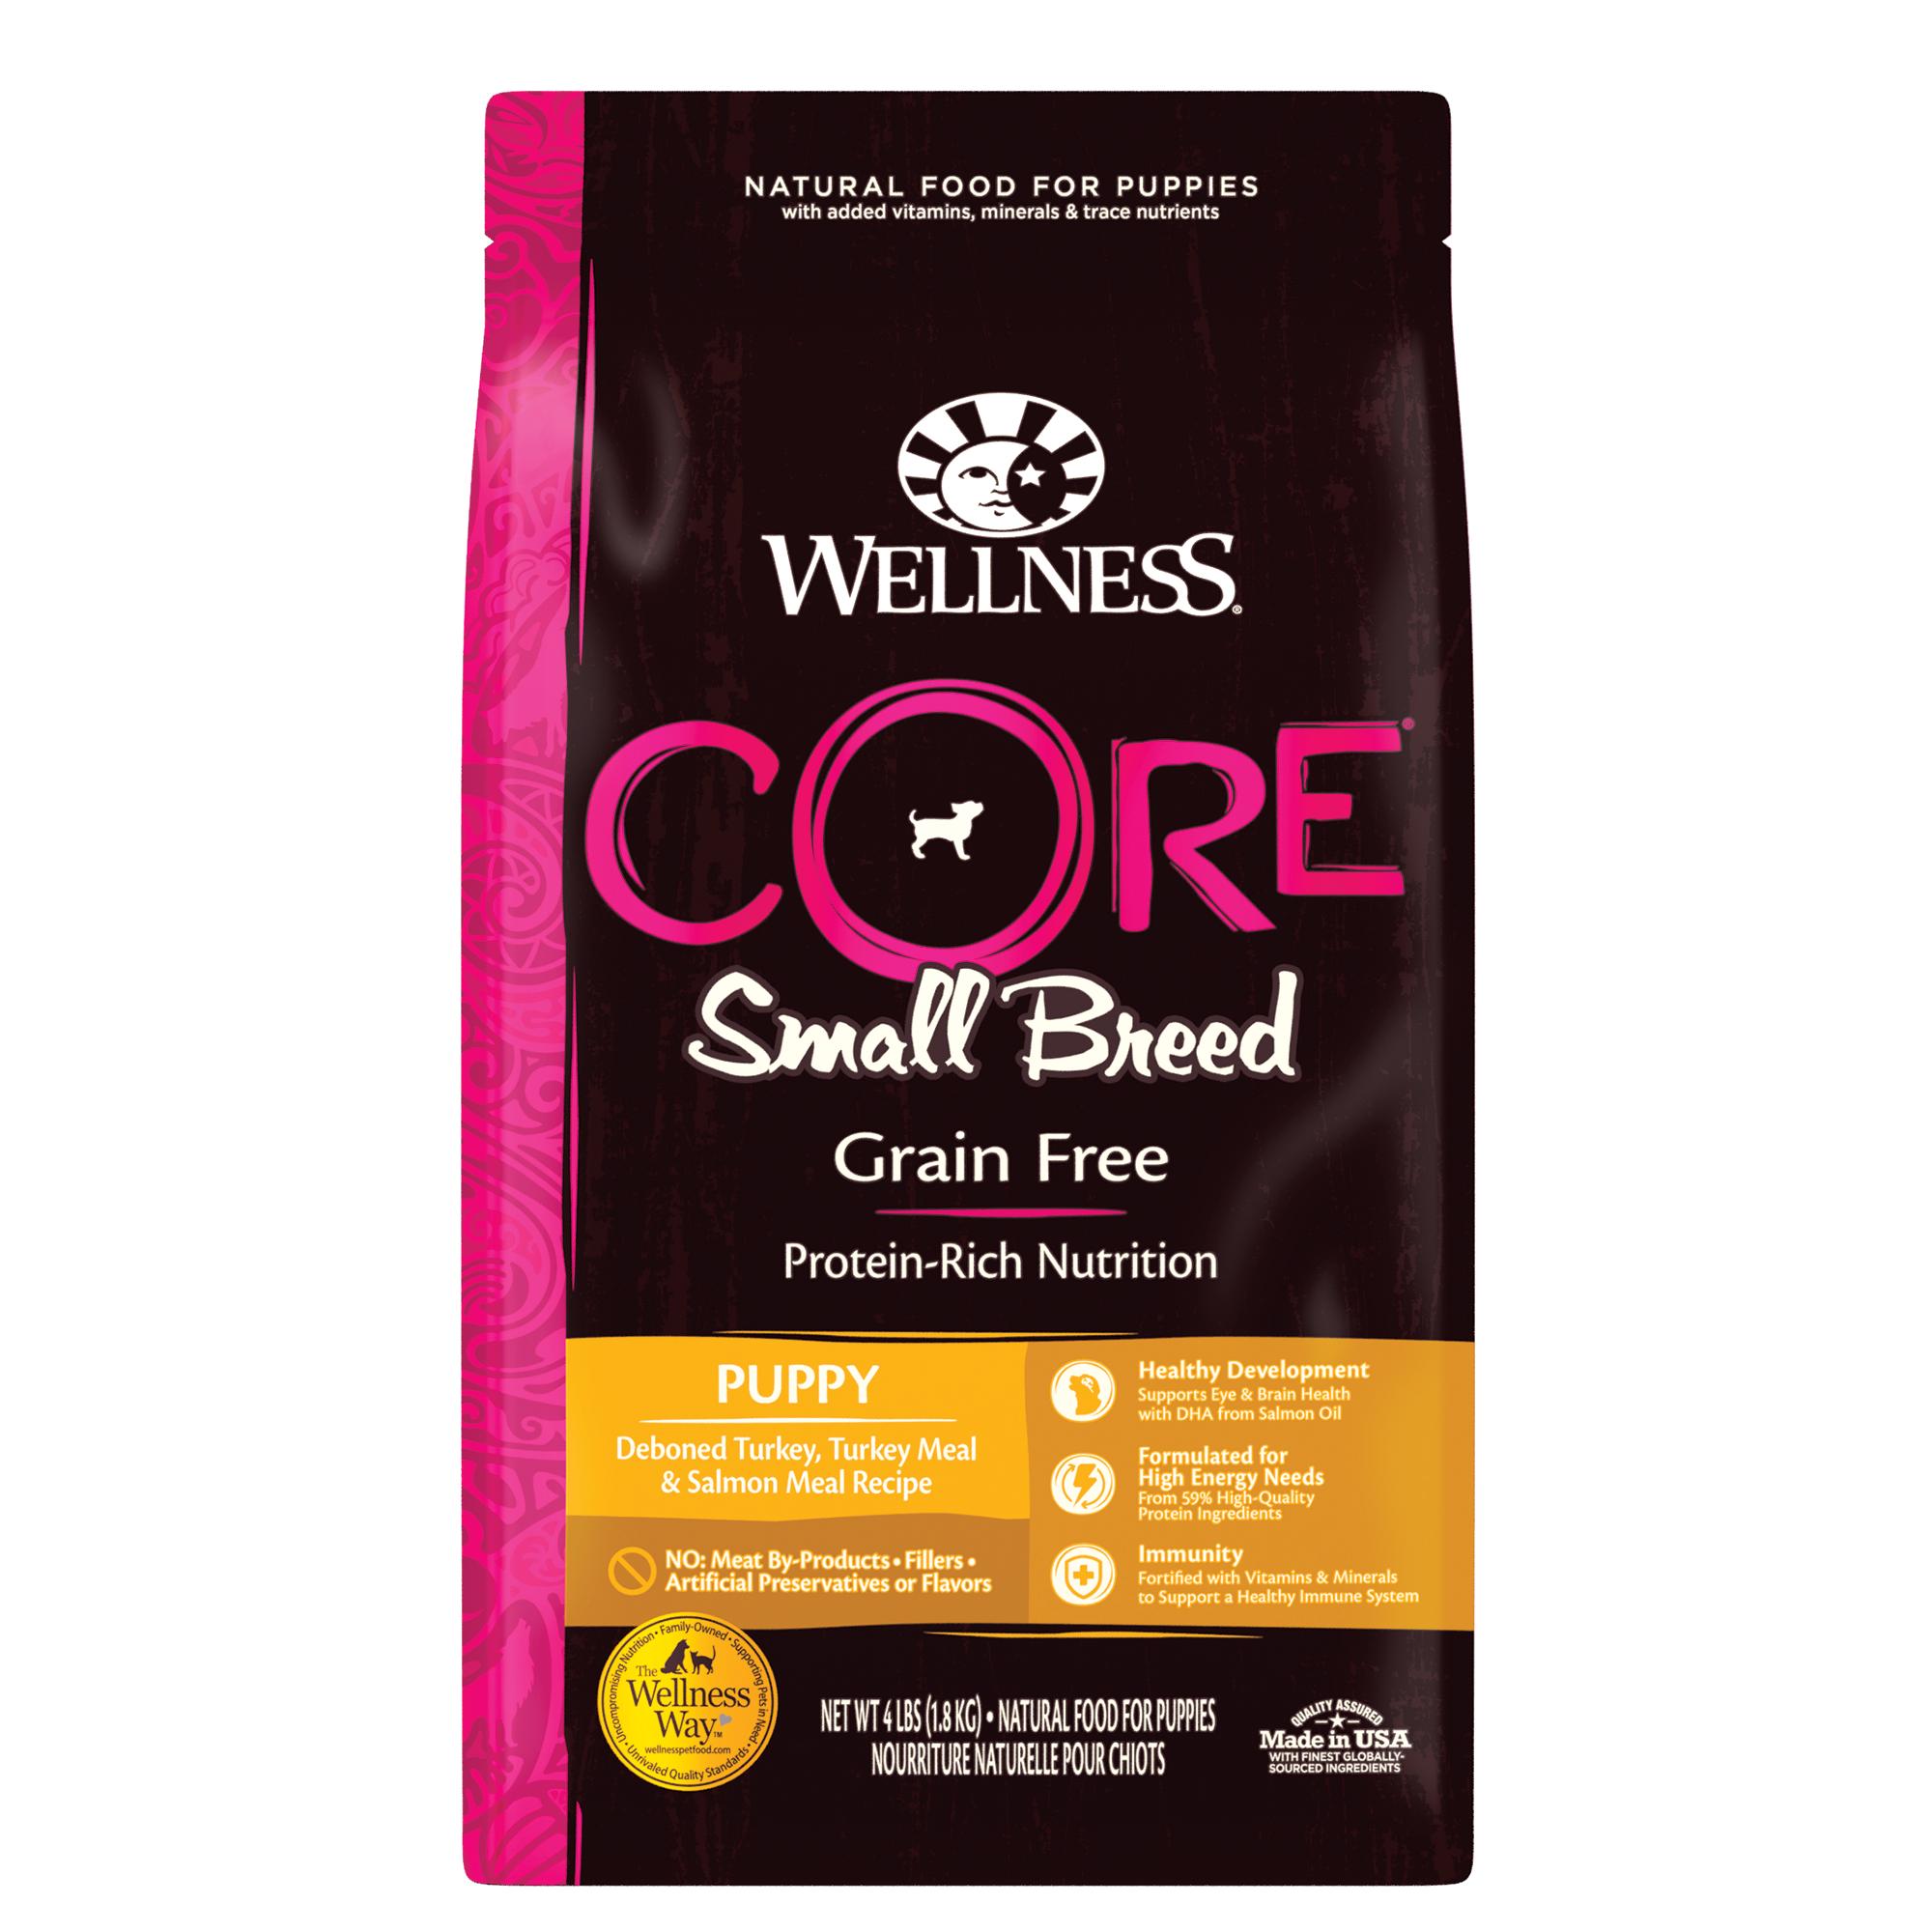 Wellness CORE Grain-Free Small Breed Puppy Turkey & Salmon Dry Dog Food, 4-lb